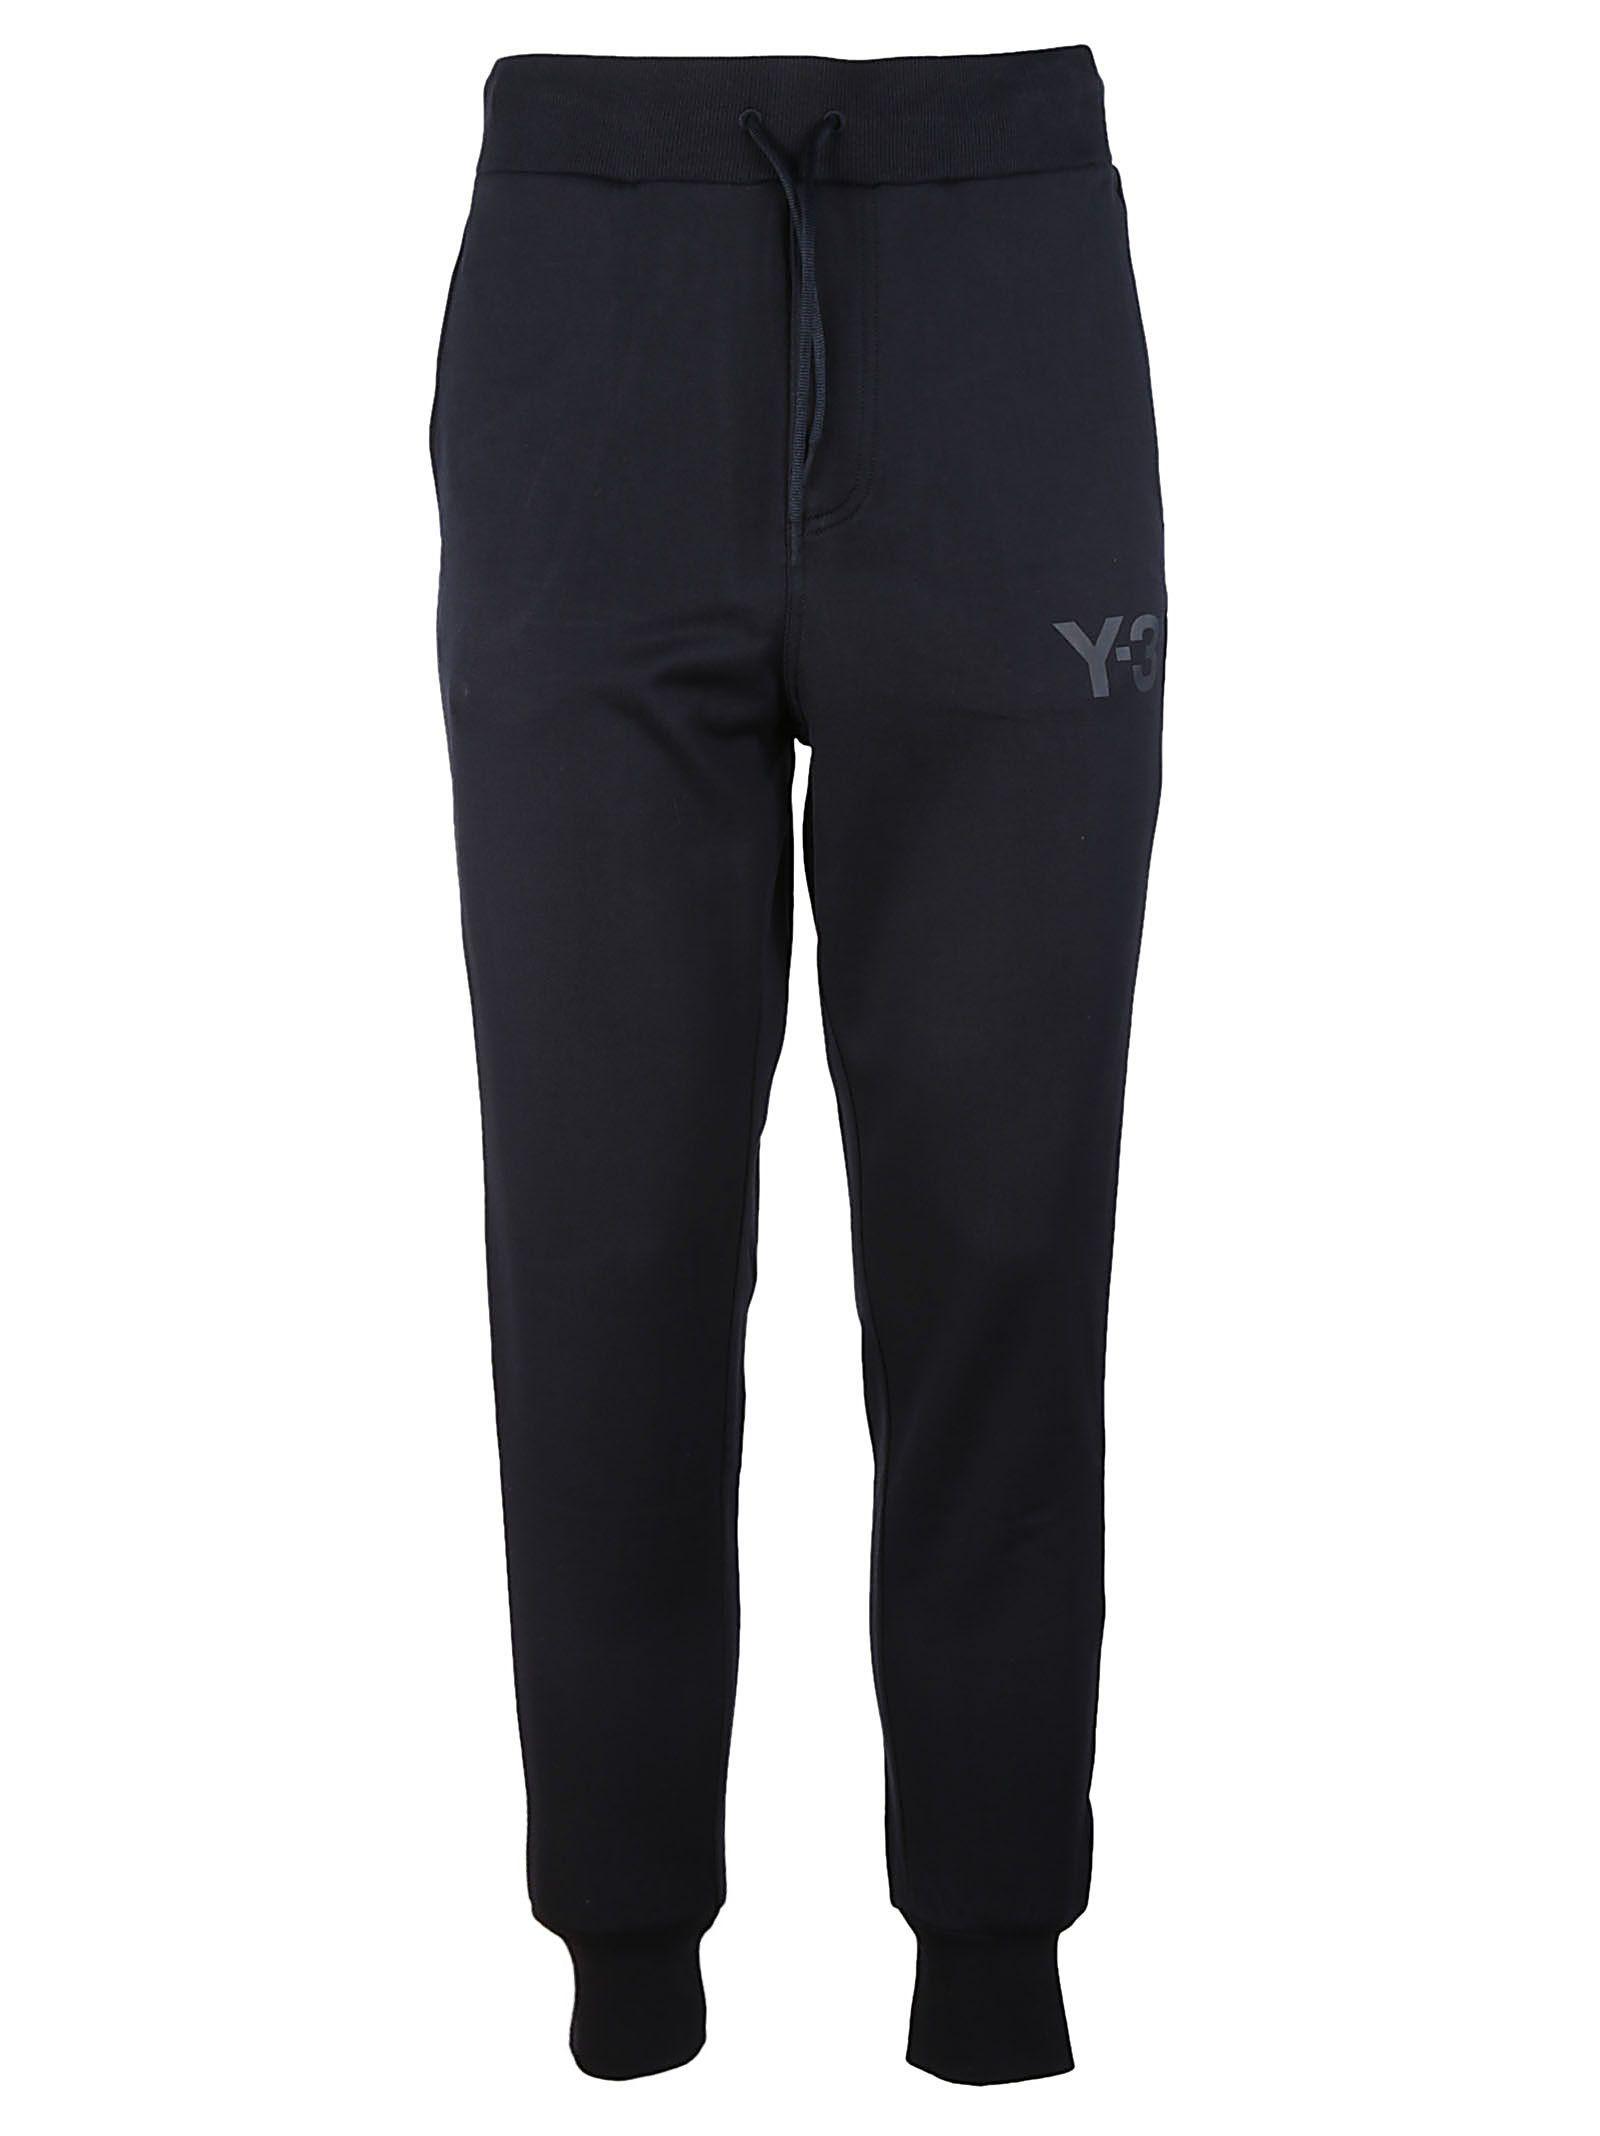 Y-3 Logo Print Track Pants